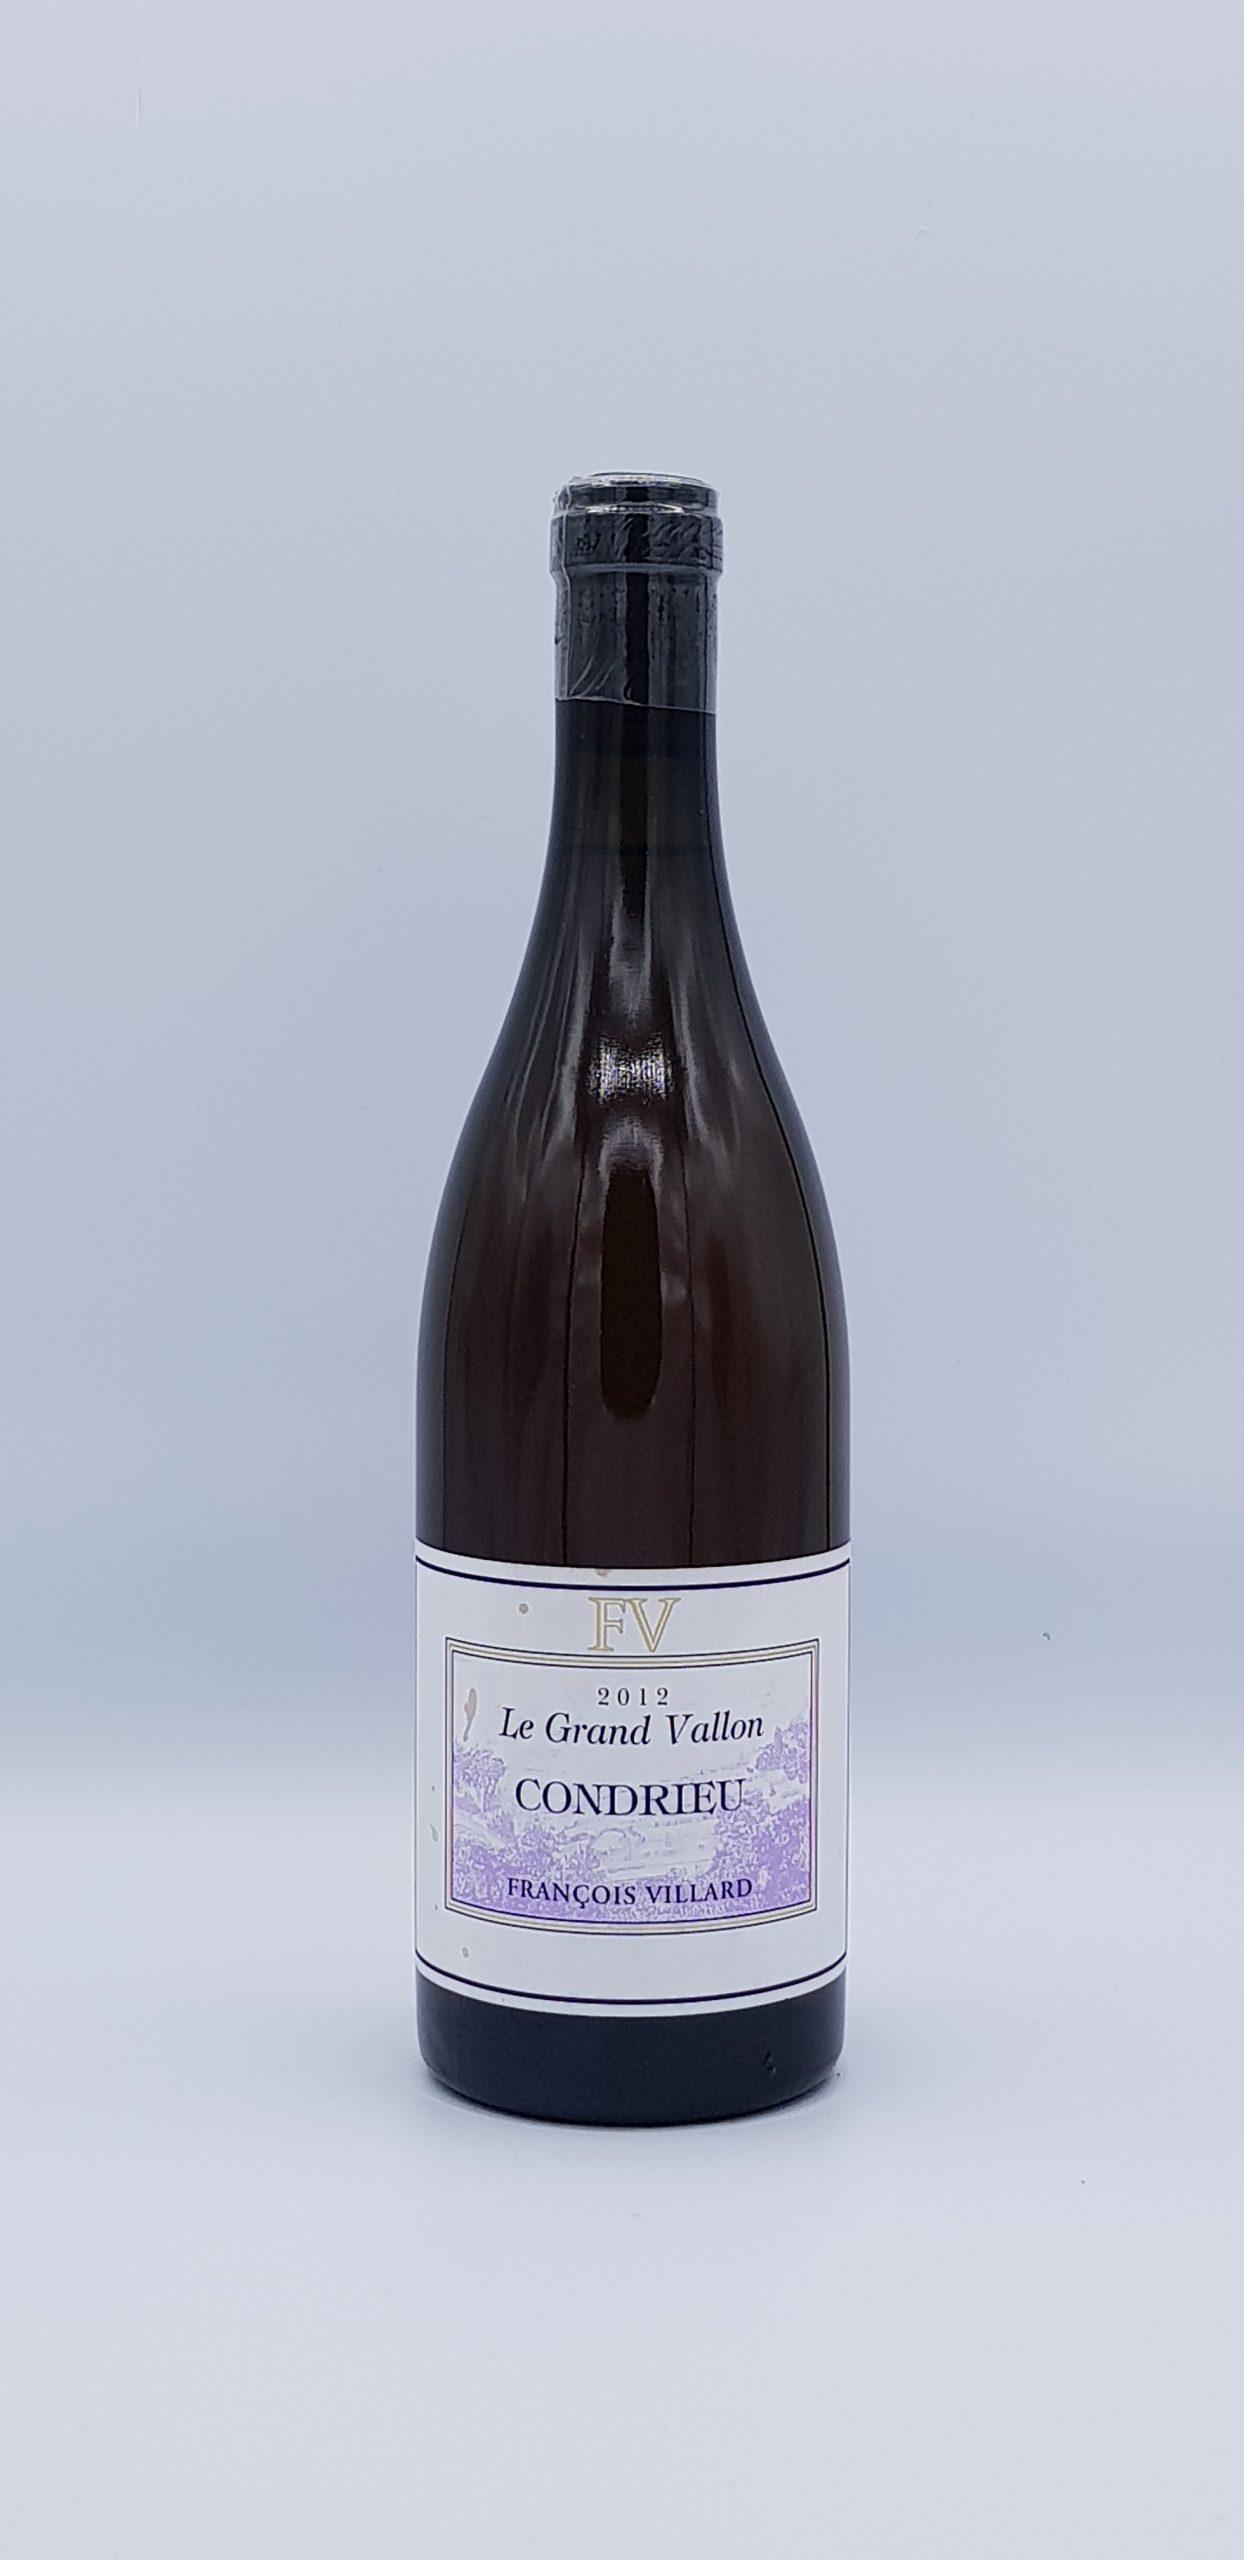 Rhone Condrieu 2012 Blanc Grand Vallon